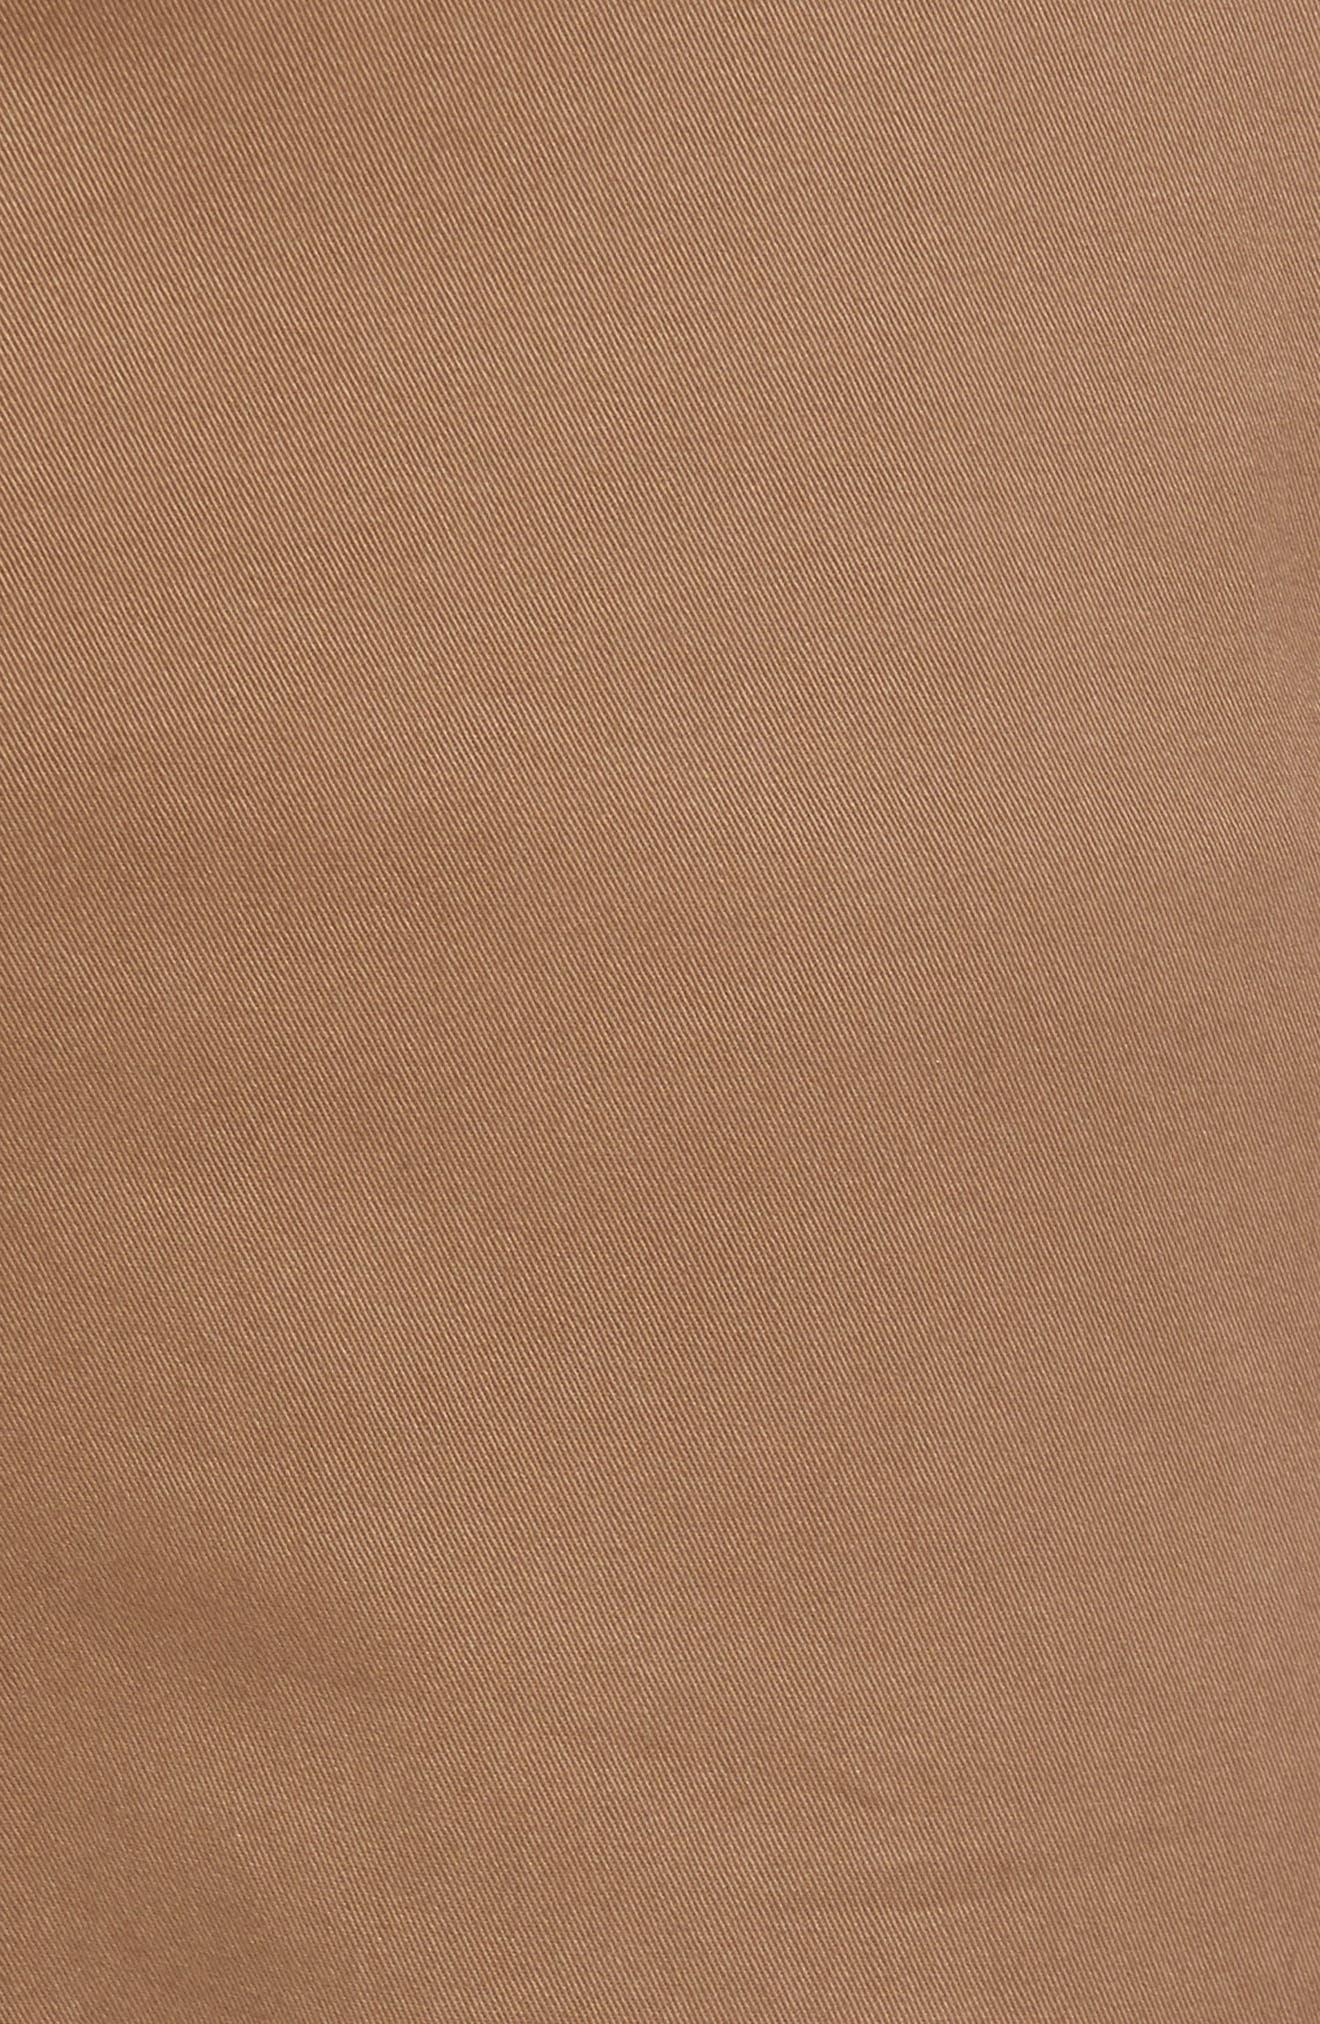 Ballard Slim Fit Stretch Chinos,                             Alternate thumbnail 6, color,                             Brown Shitake